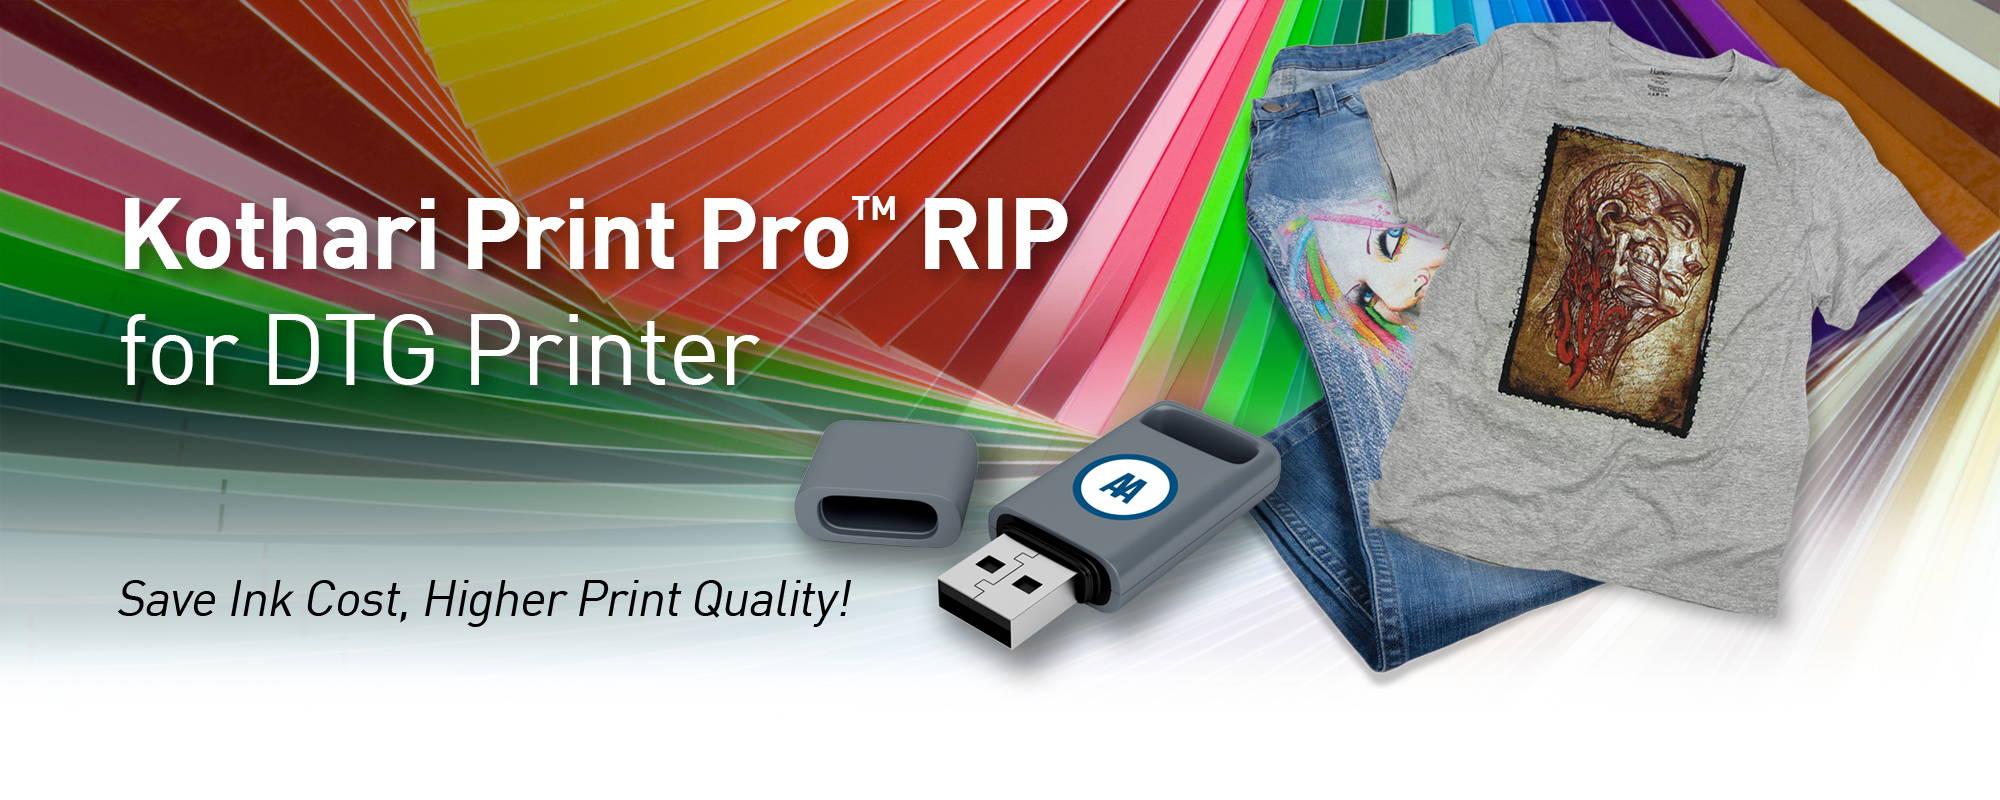 Kothari Print Pro Rip Software for DTG Printer